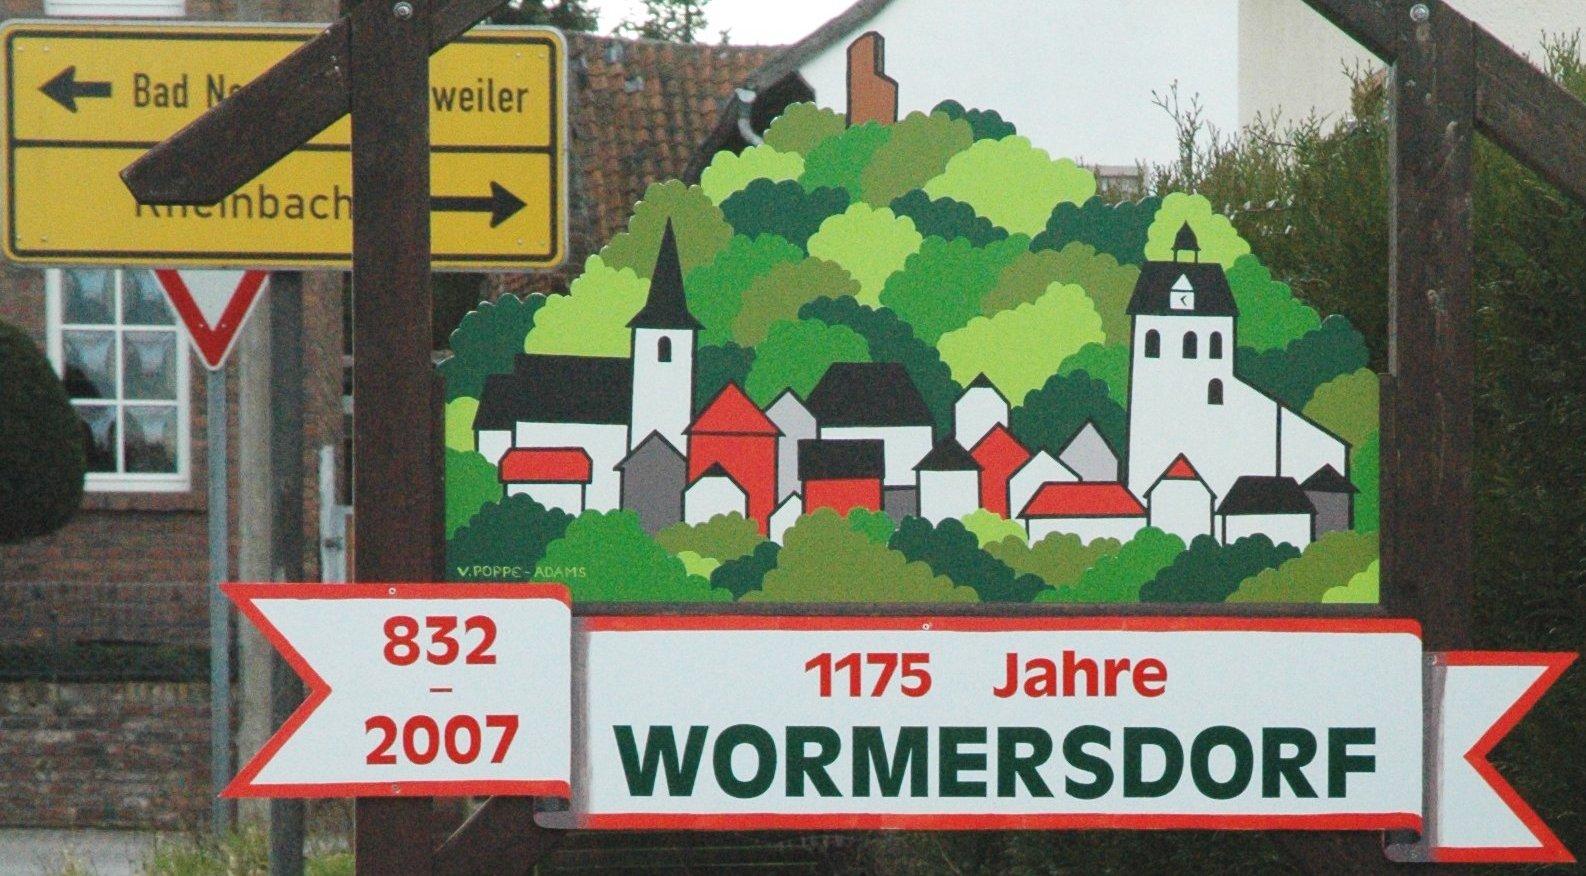 File:Wormersdorf 1175 Jahre (cropped).jpg